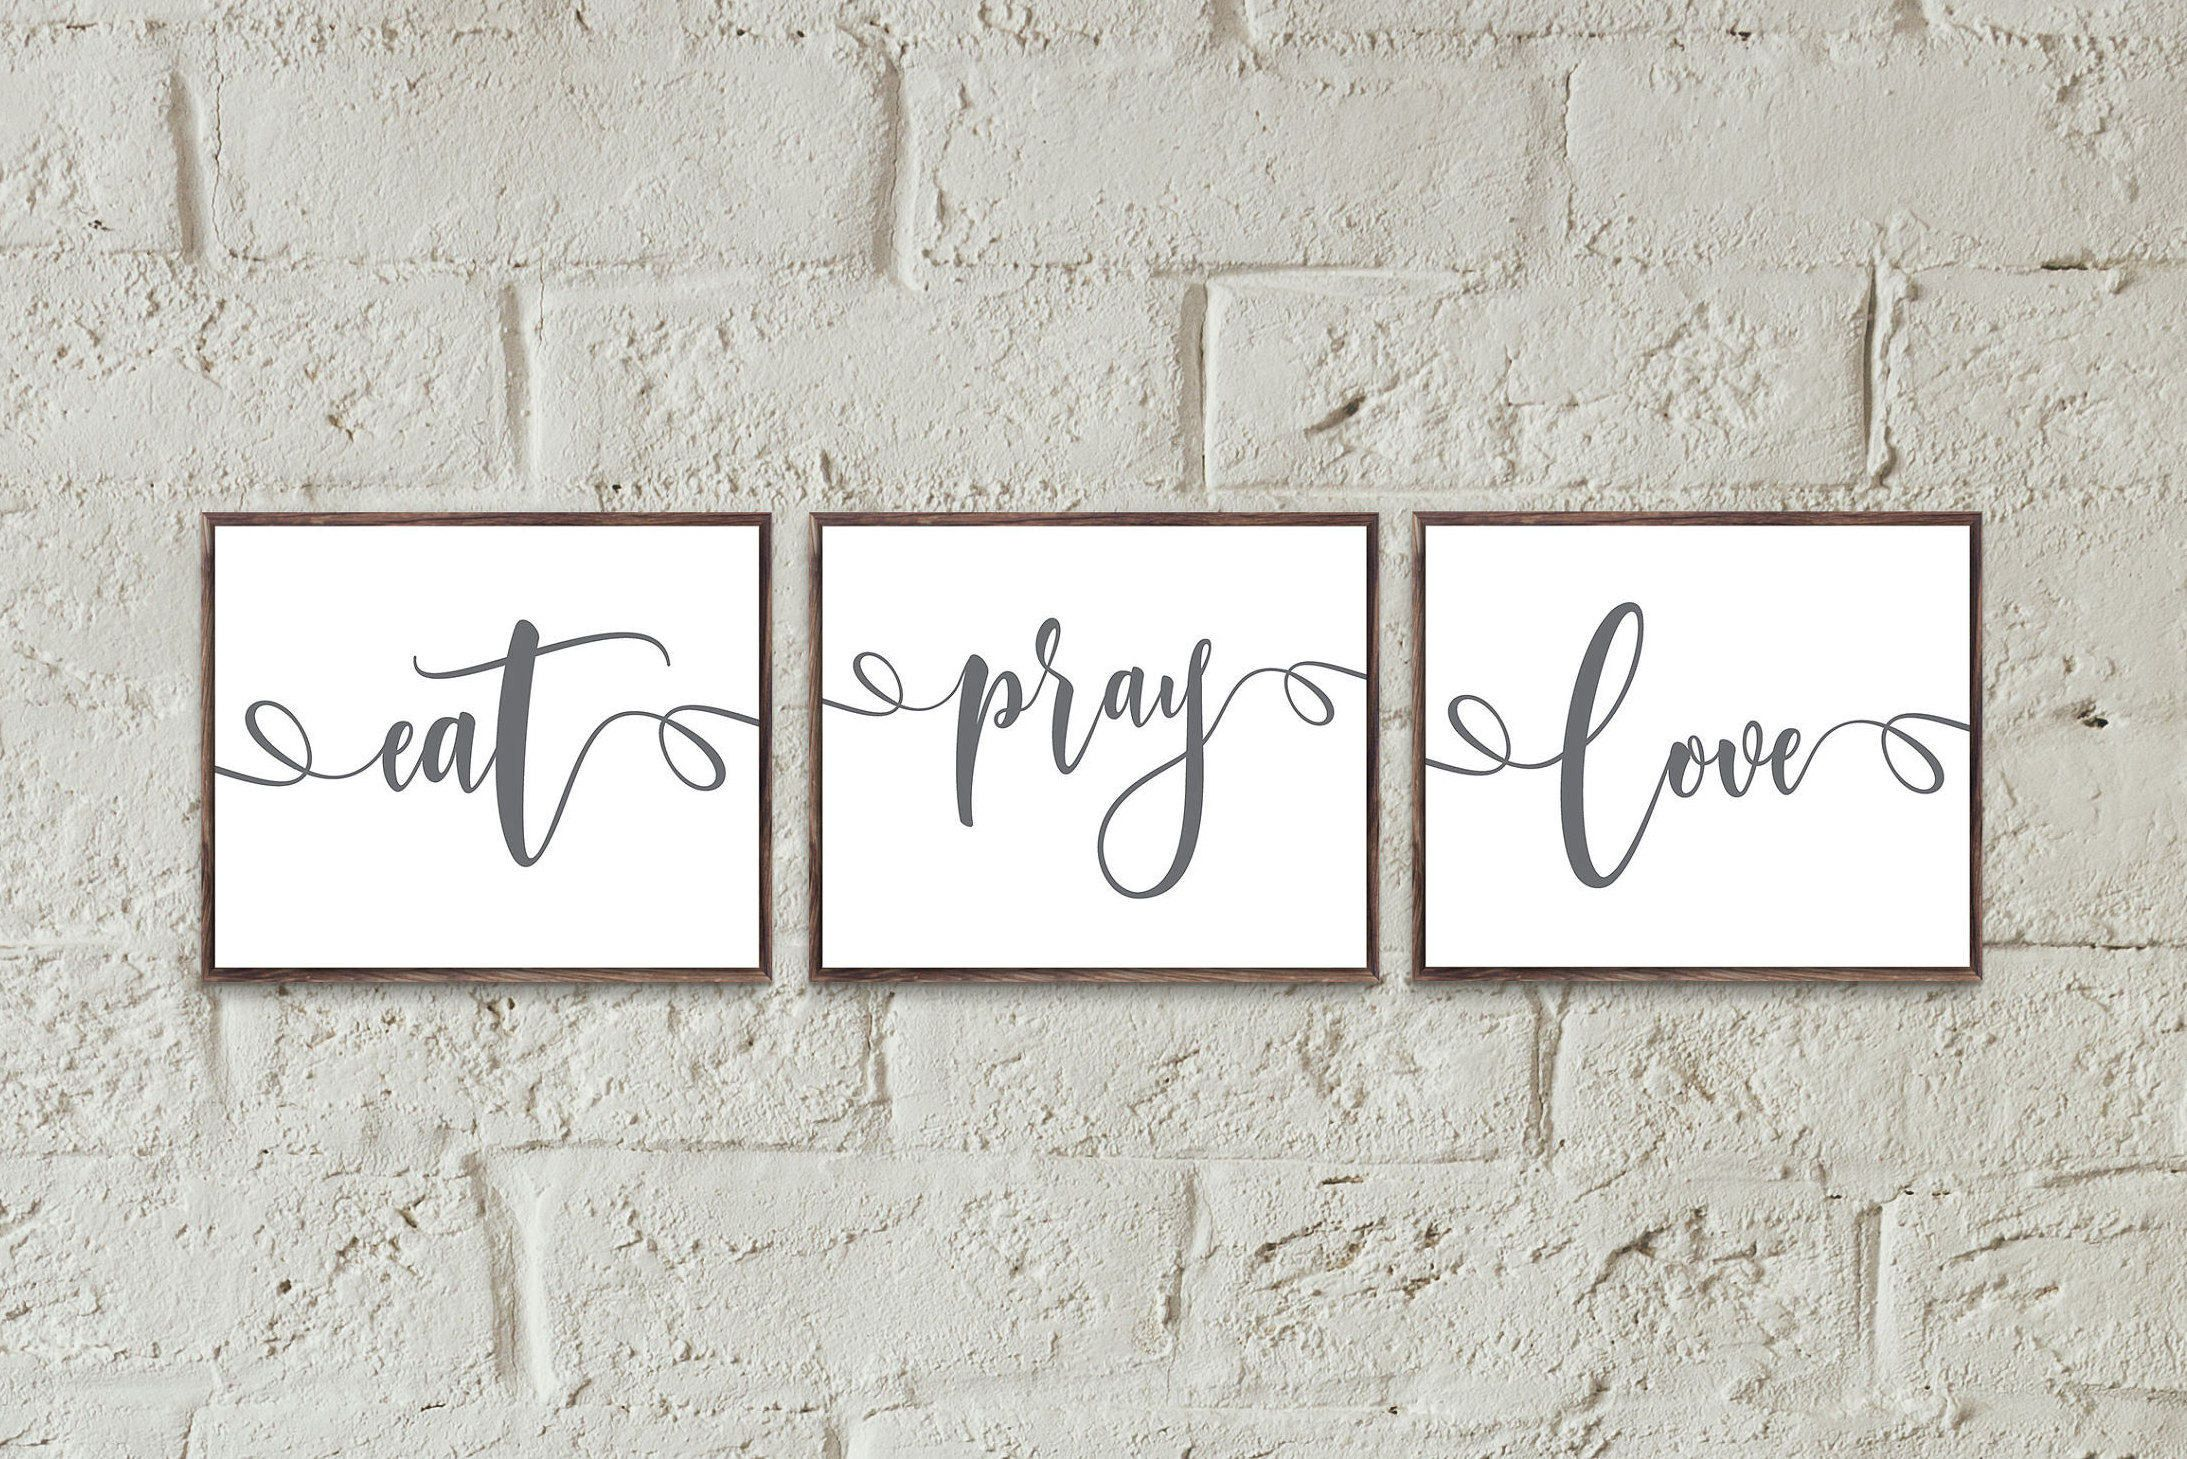 Eat pray love horizontal wall art kitchen wall decor set kitchen